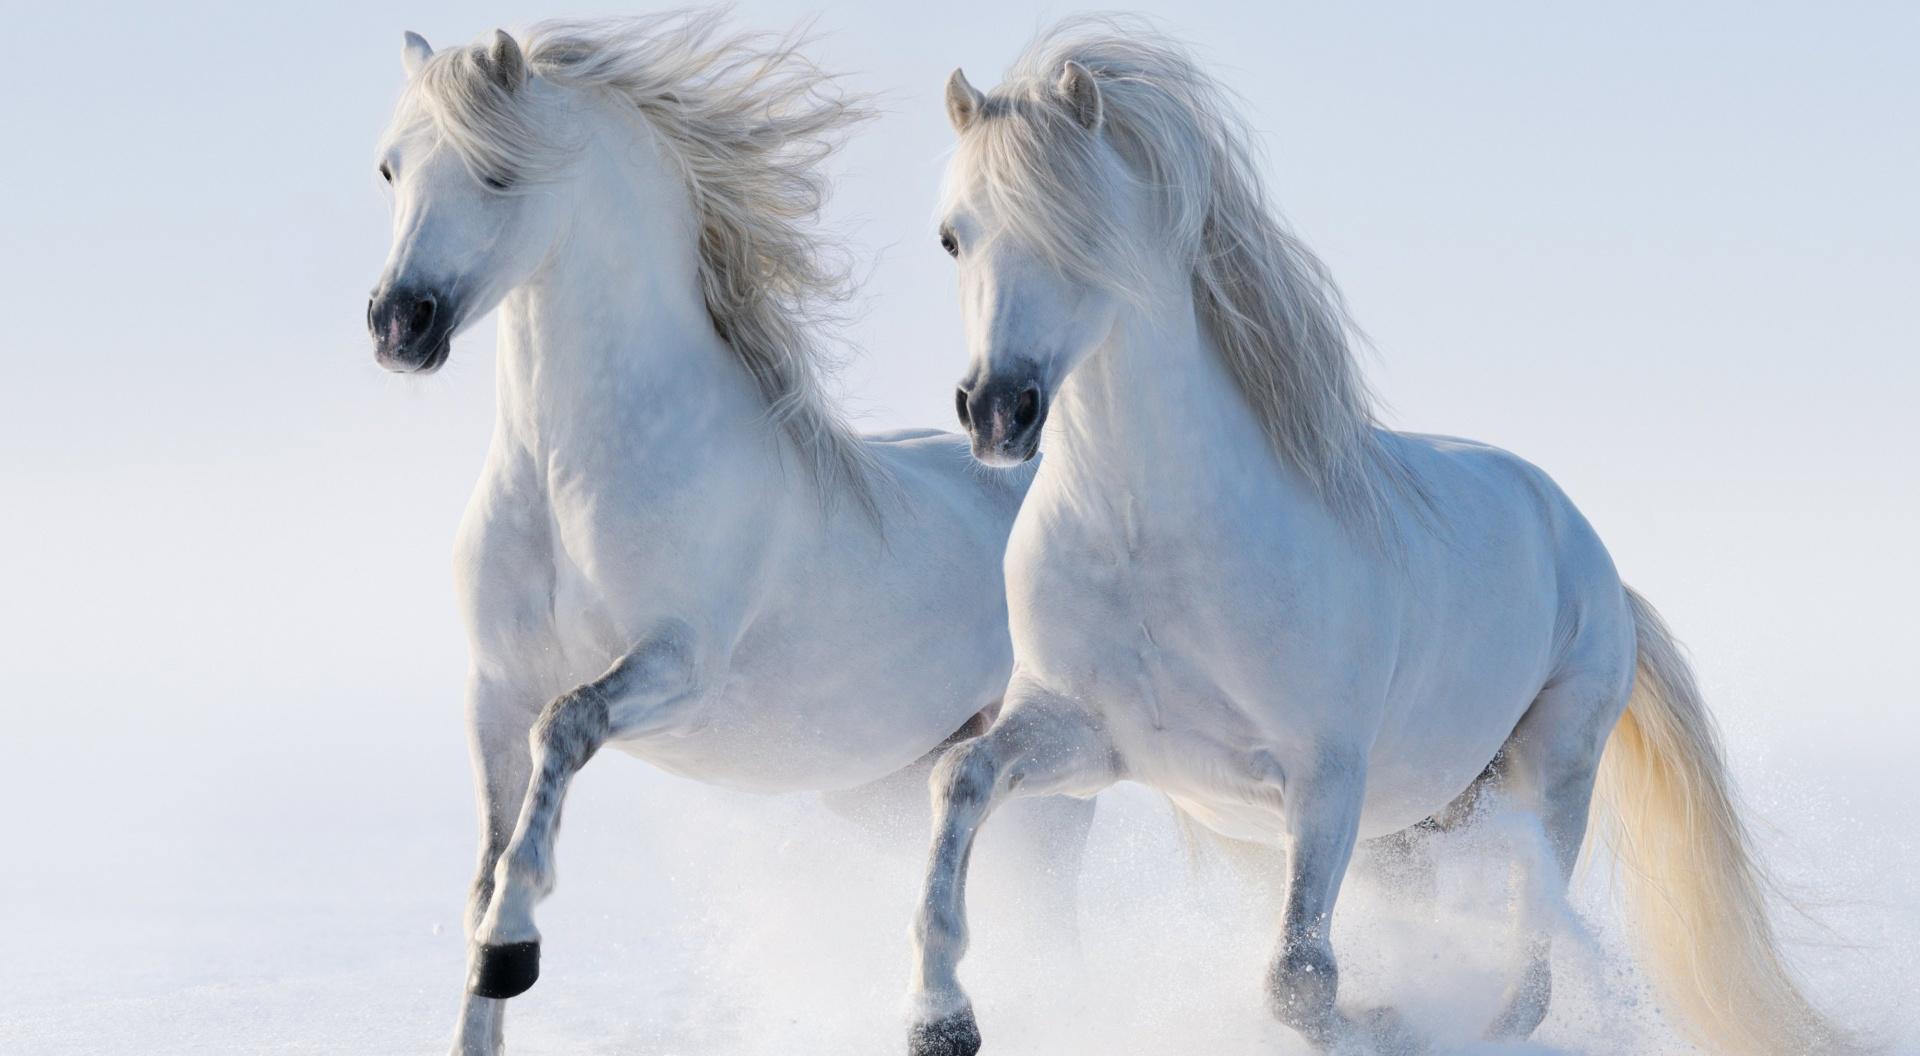 Caballos Fondos De Pantalla Horses Wallpapers Hd